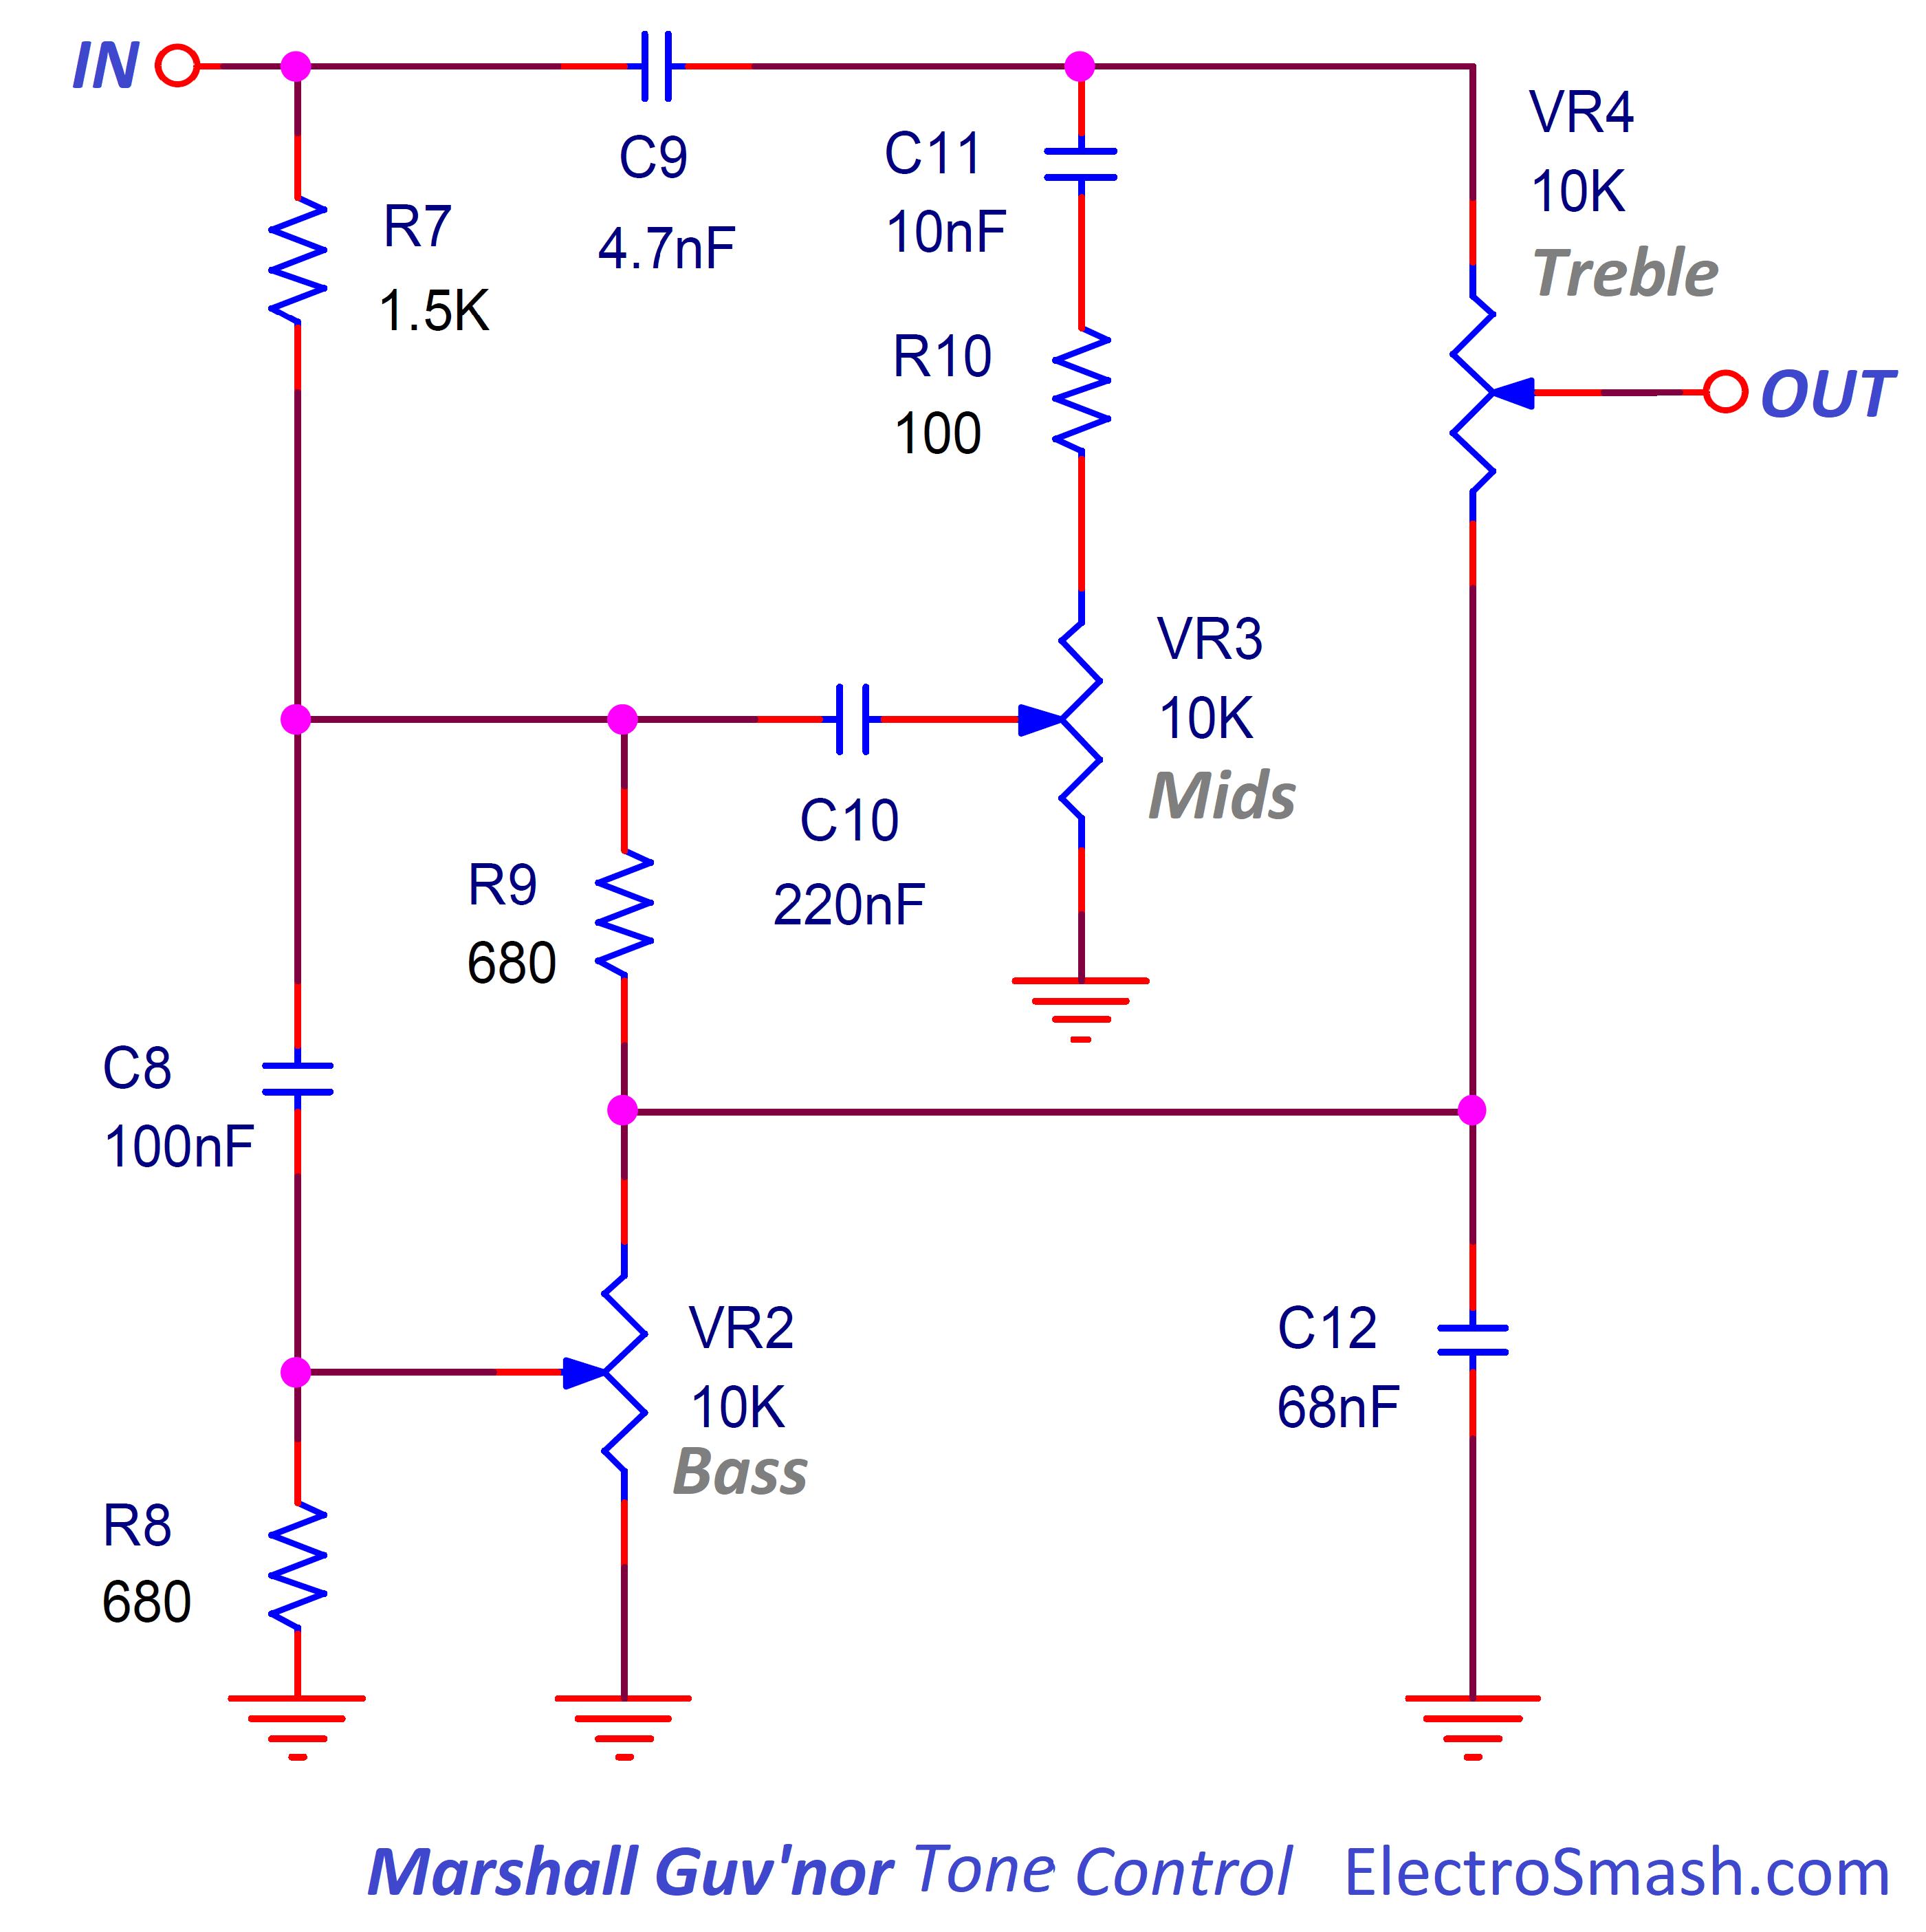 ElectroSmash - Marshall The Guvnor Analysis